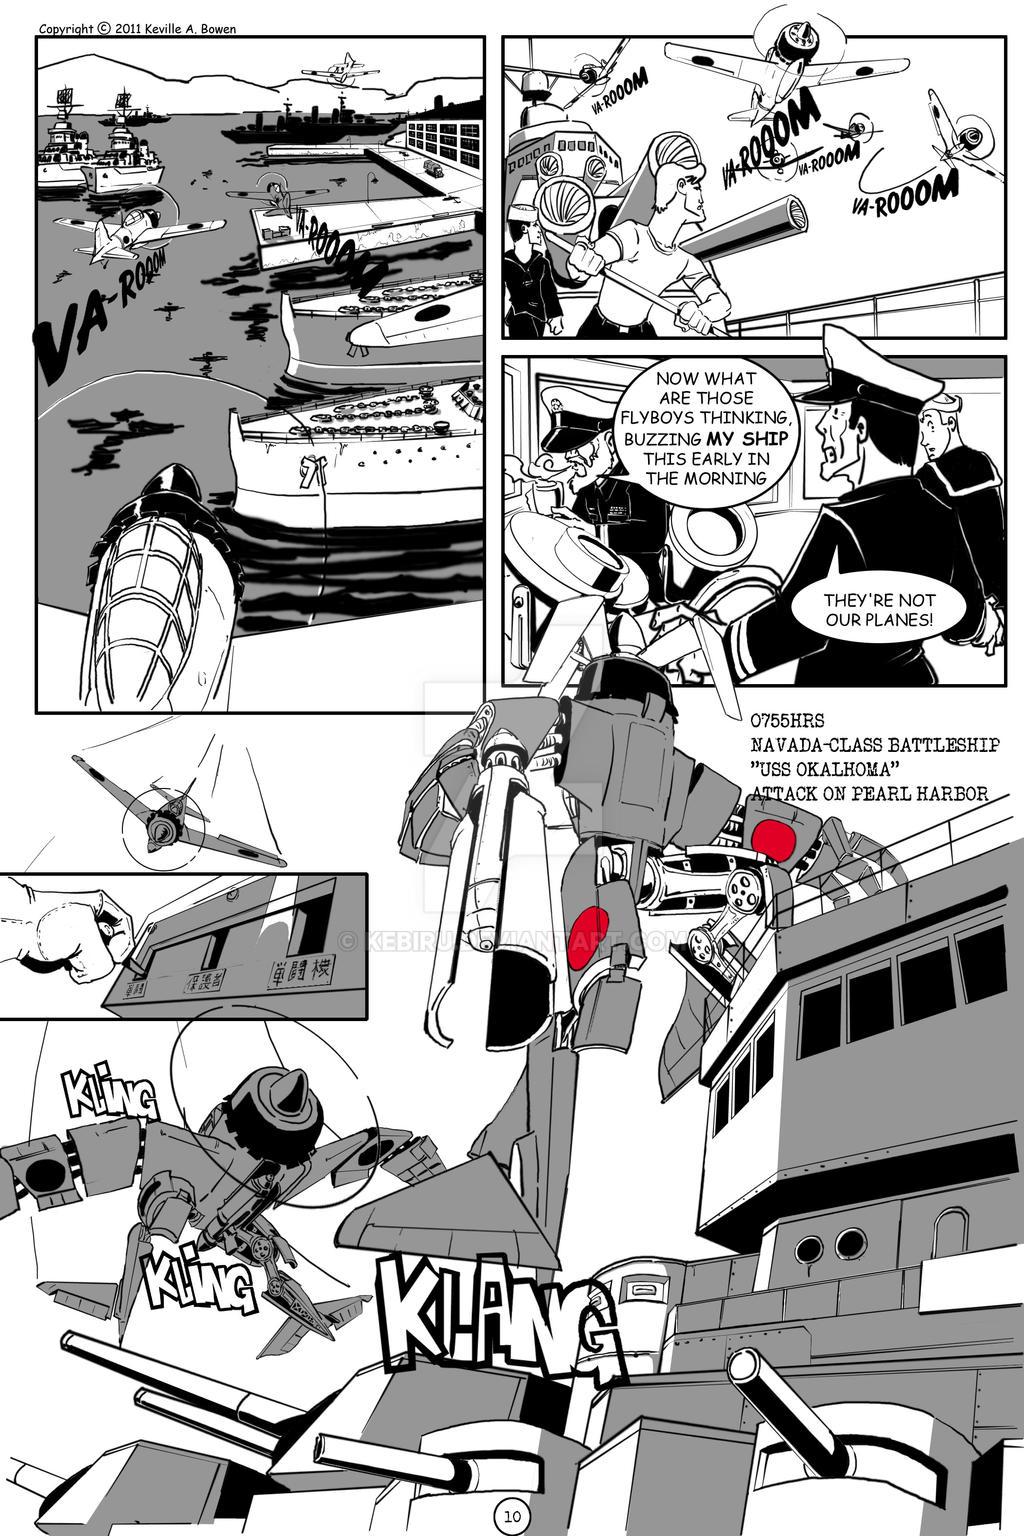 Clash at VT p.10 by Kebiru